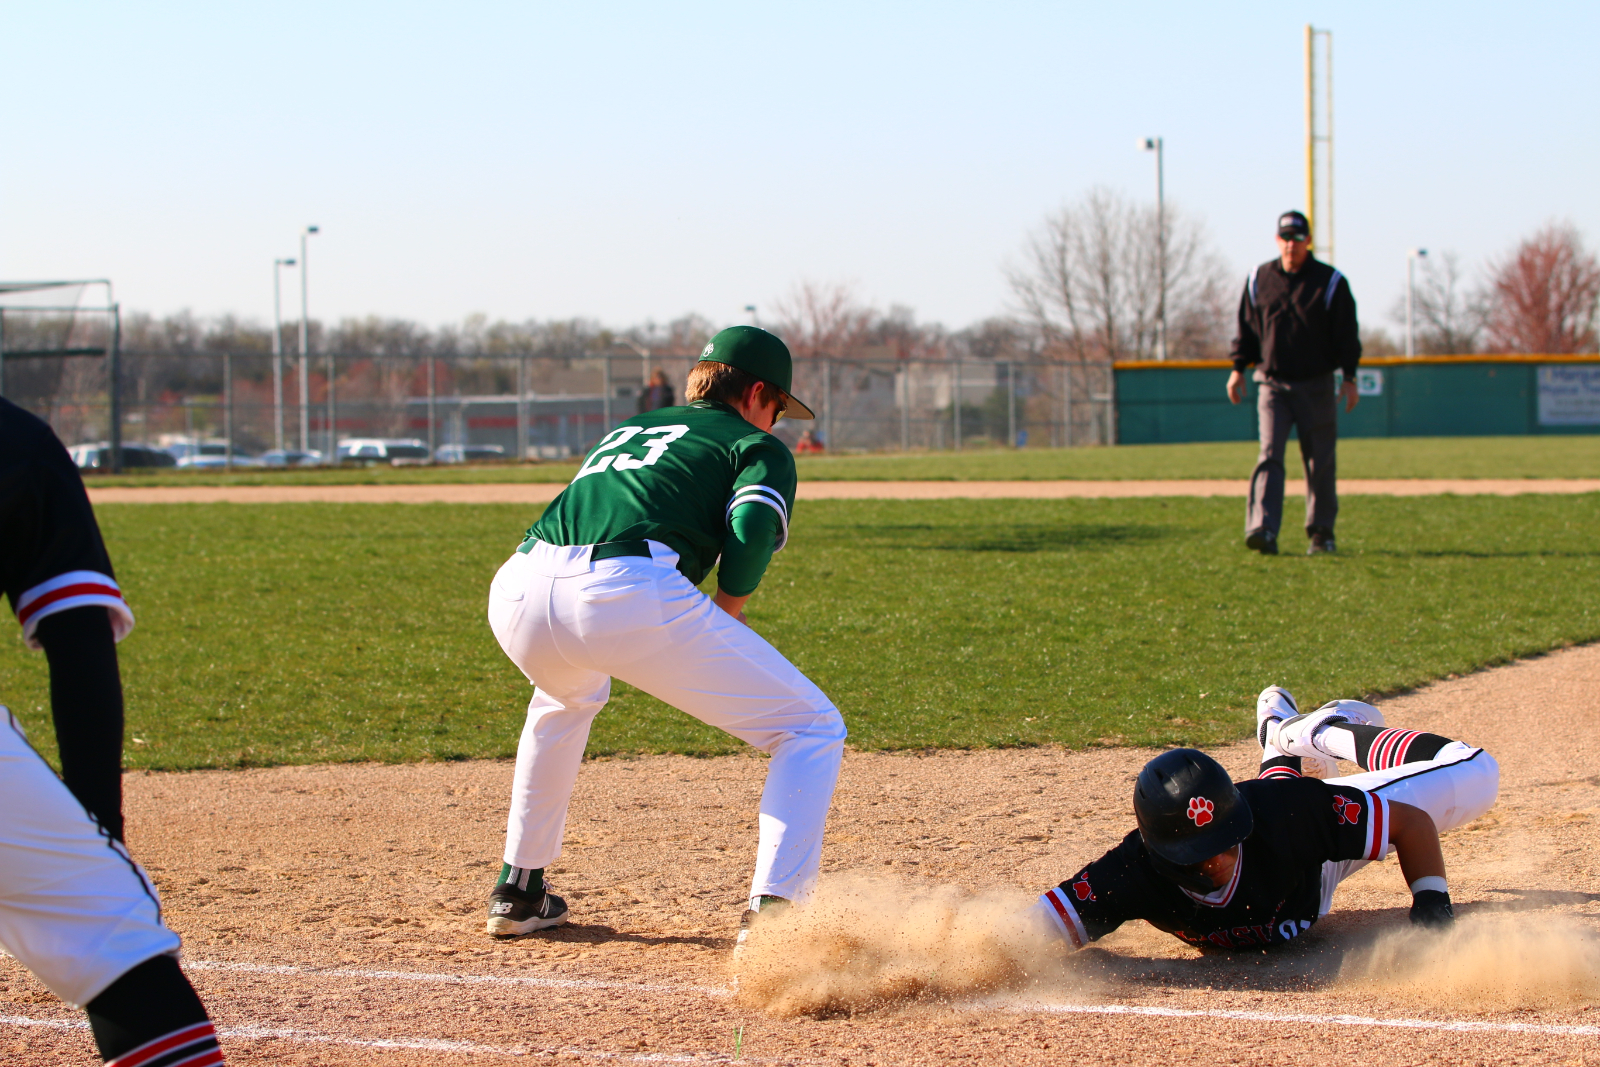 PHOTOS: Varsity Baseball vs. Lansing 4.1.21